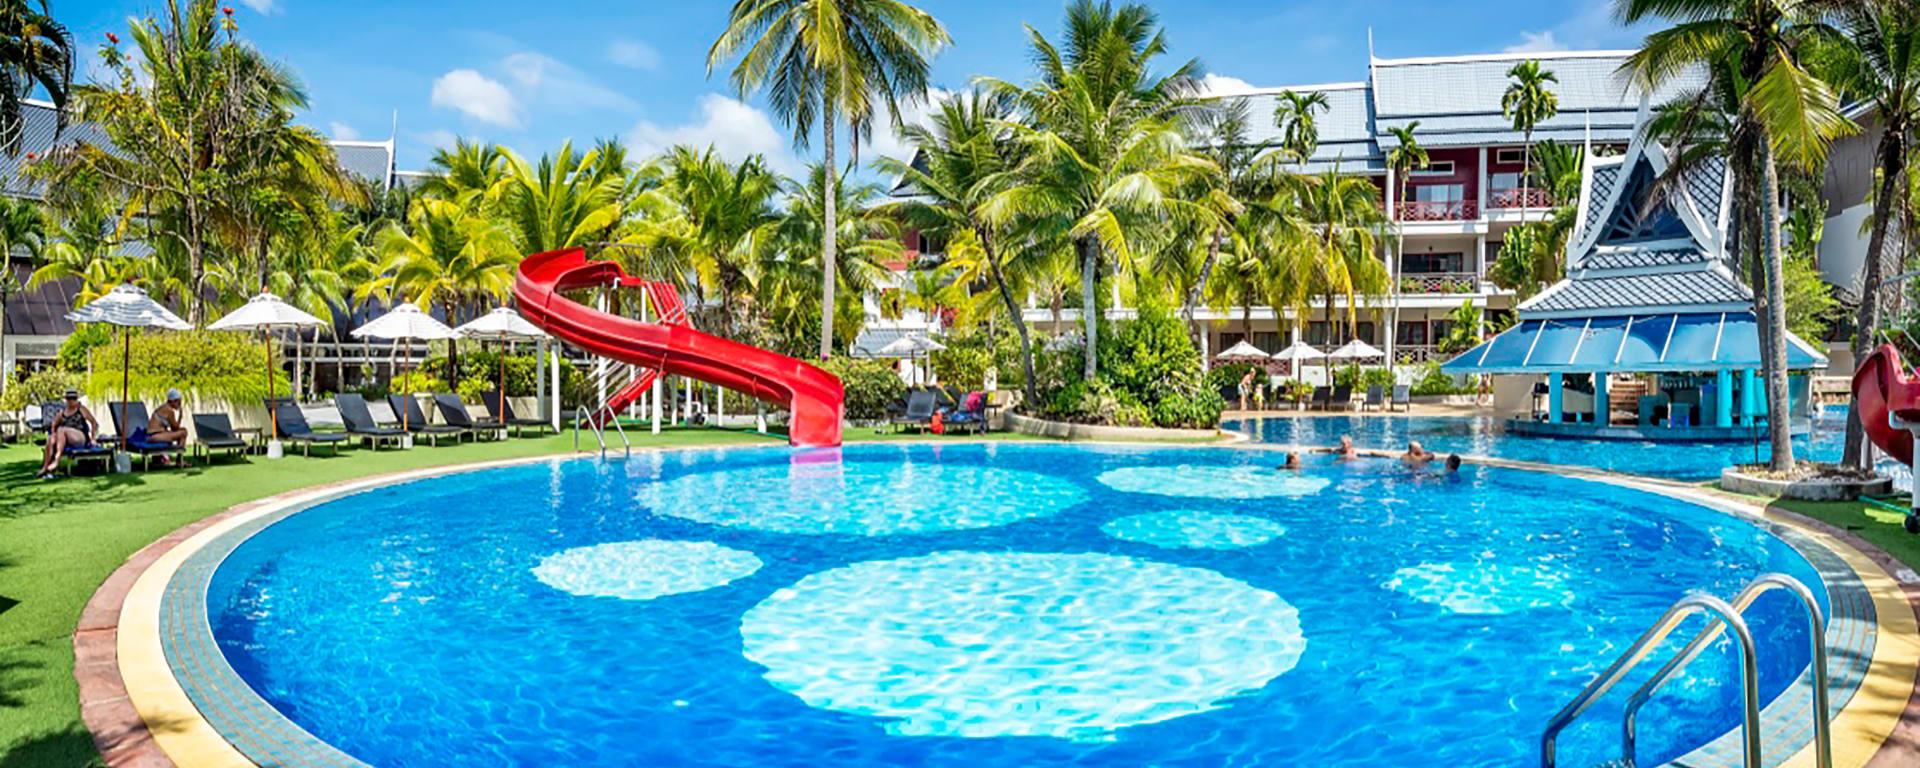 Cha Da Thai Village Resort in Krabi: Krabi Cha Da Thai Village Resort Pool